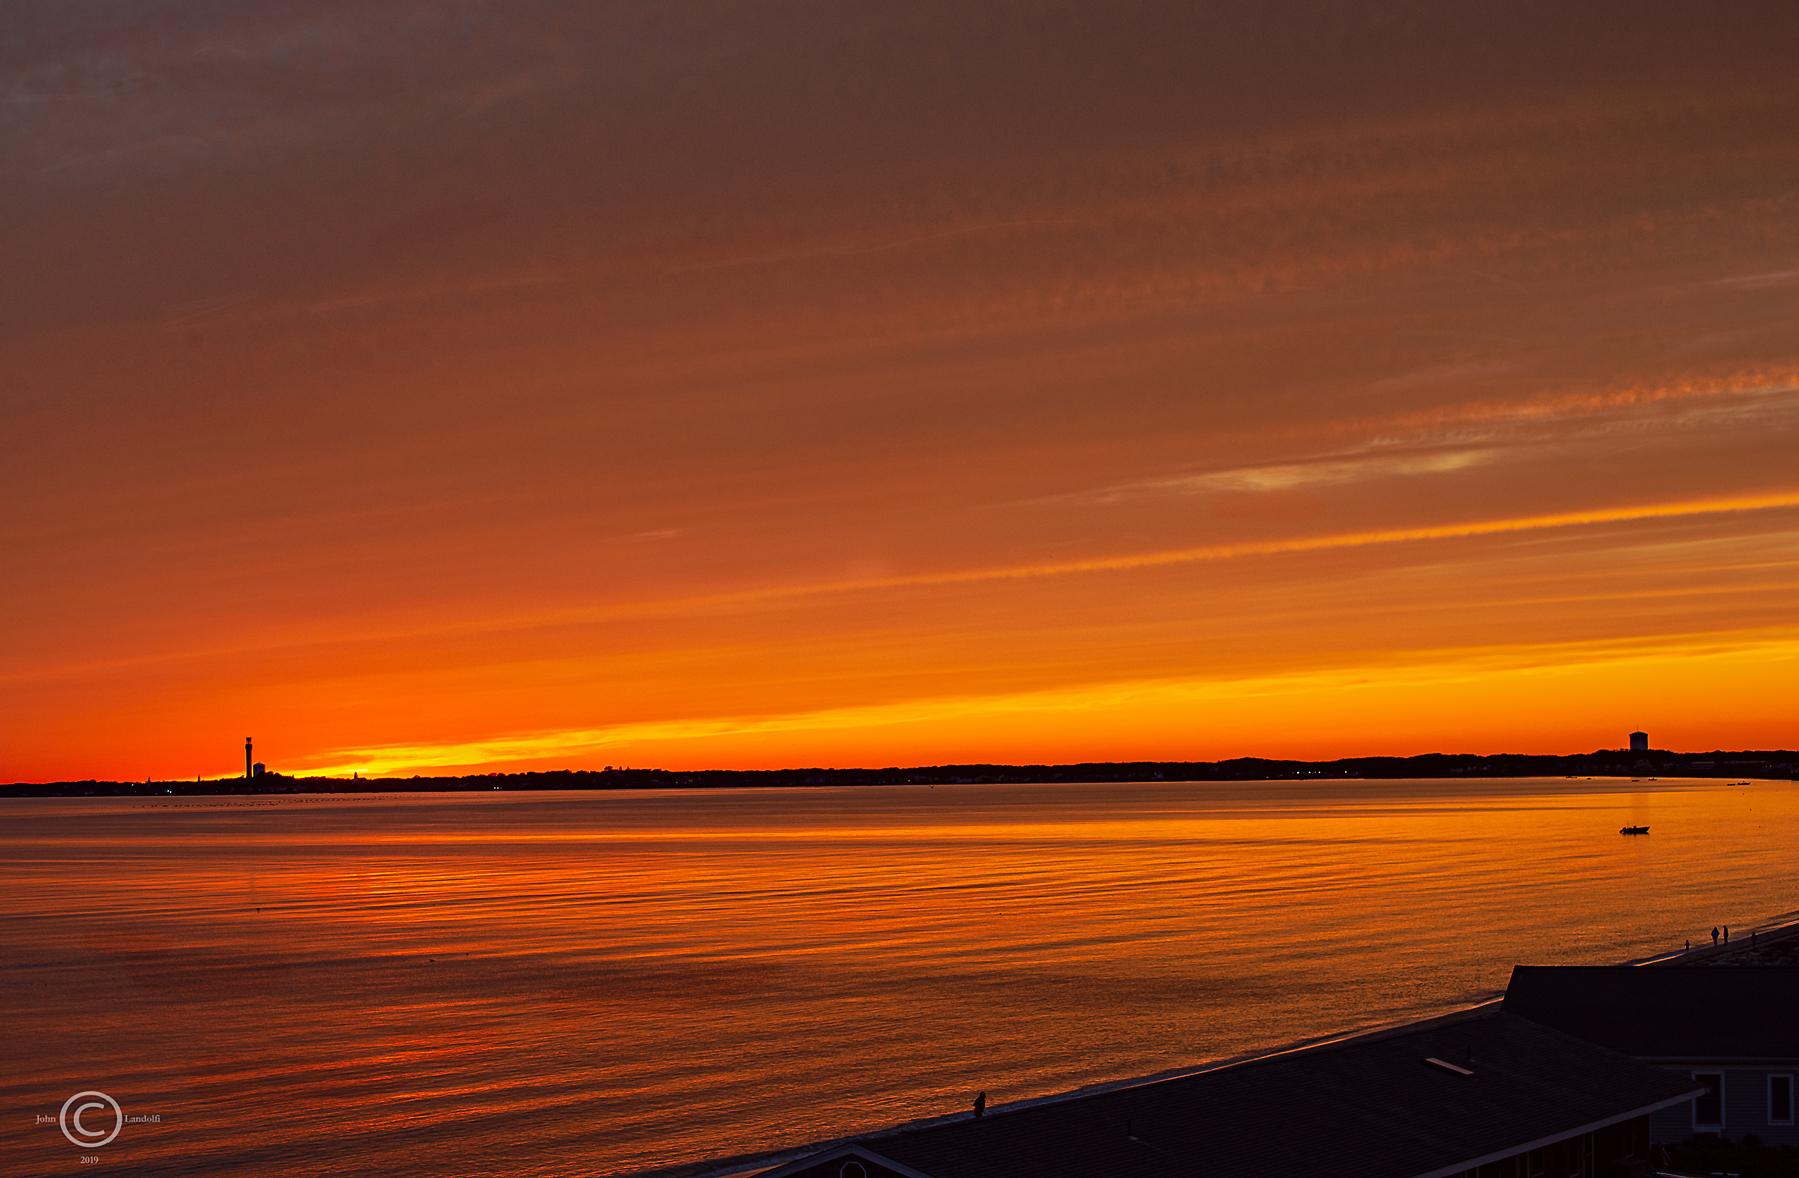 Cape-Cod-2019-Sunset-No1